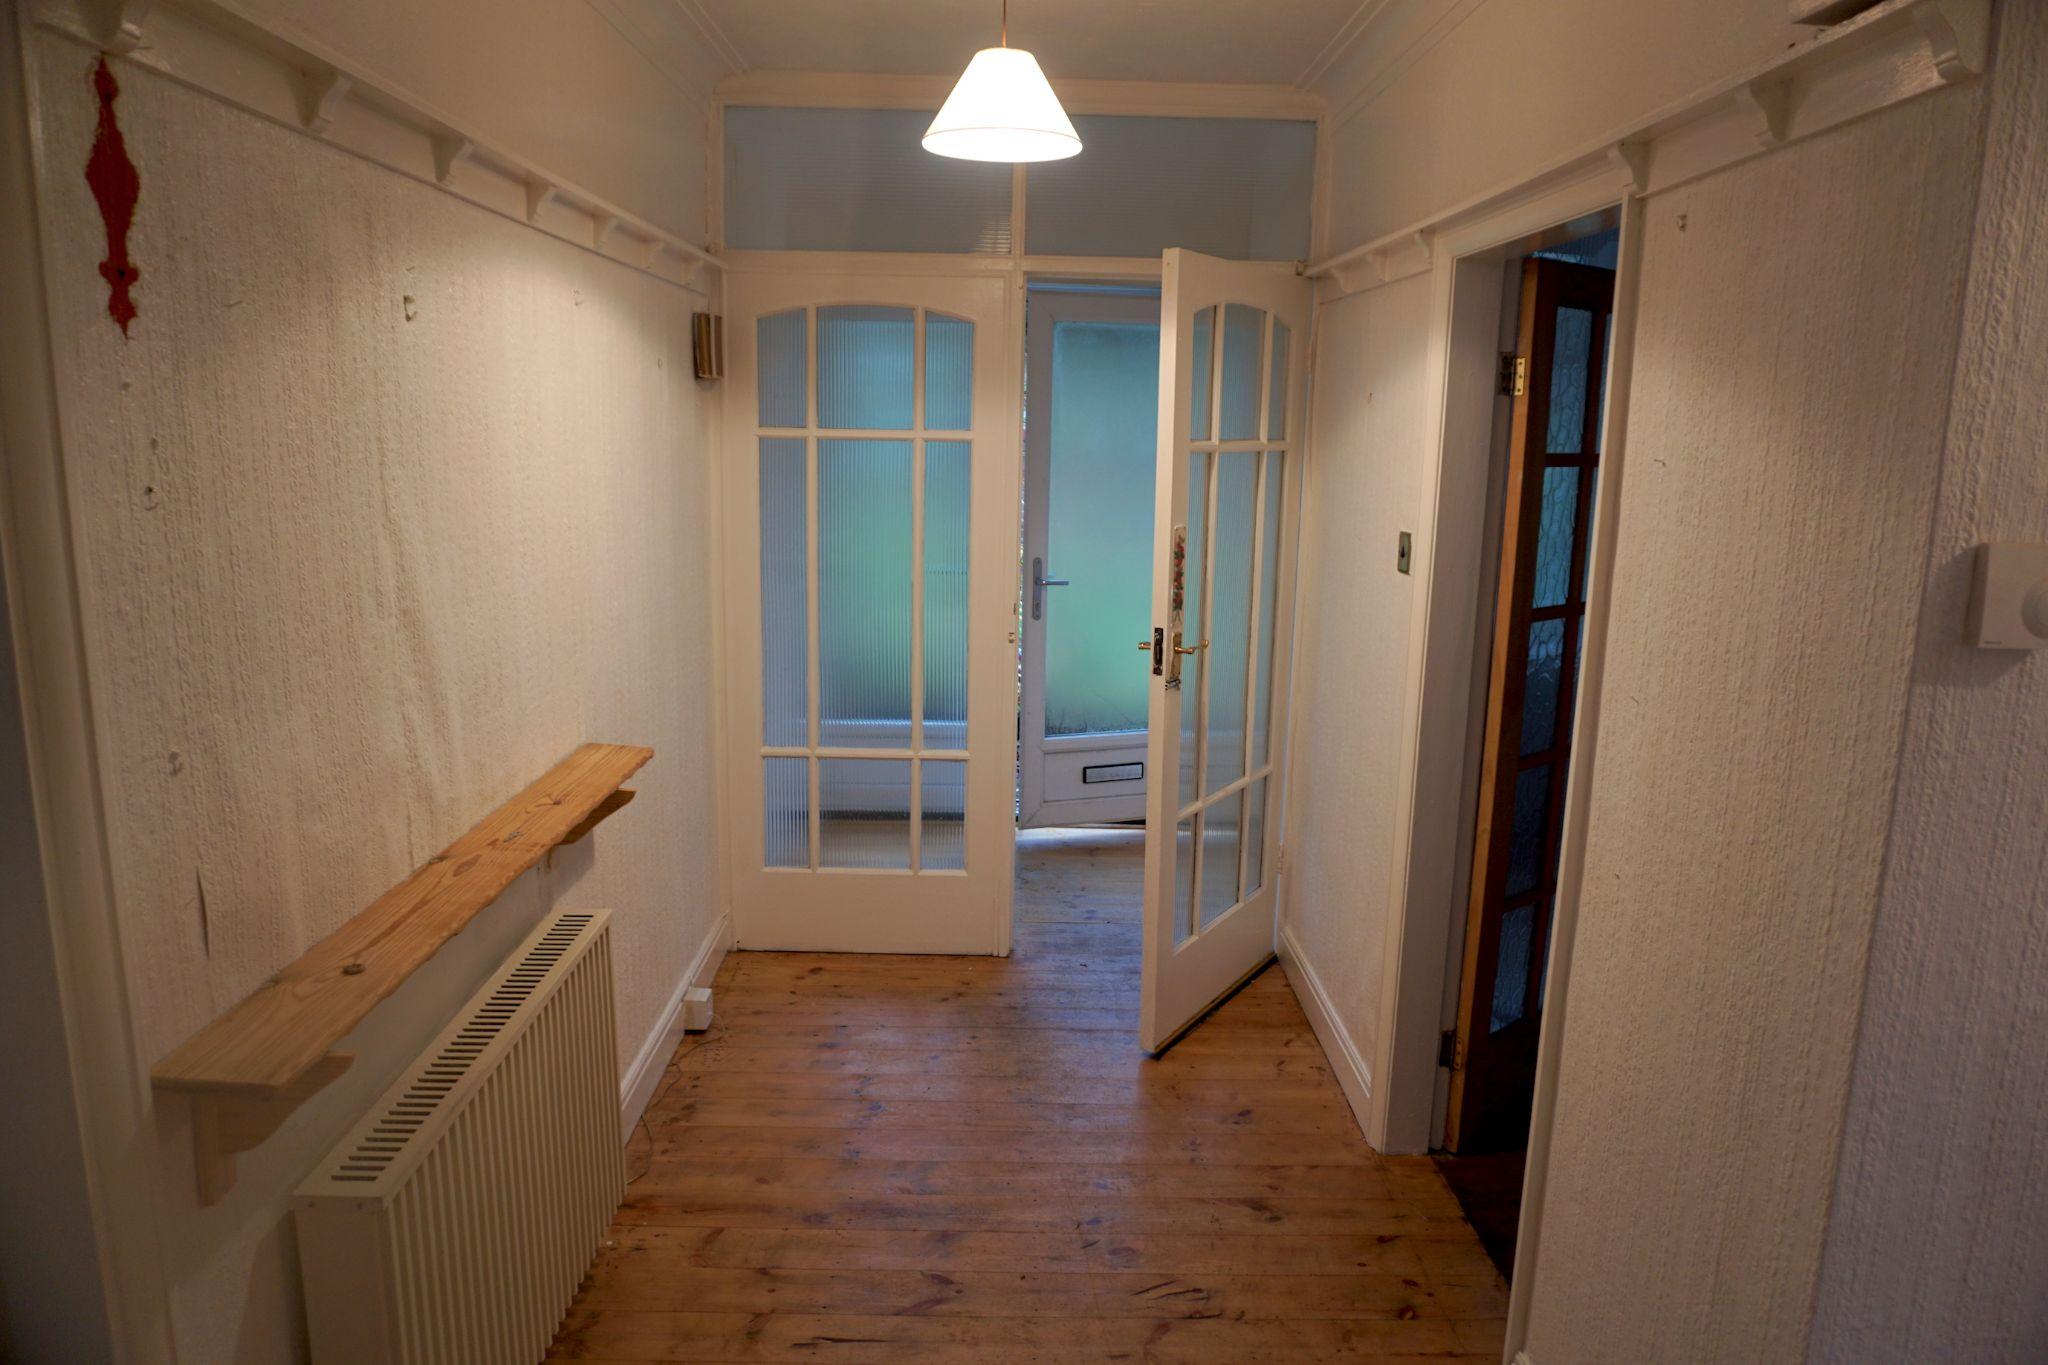 2 Bedroom Detached Bungalow For Sale - Entrance Hall